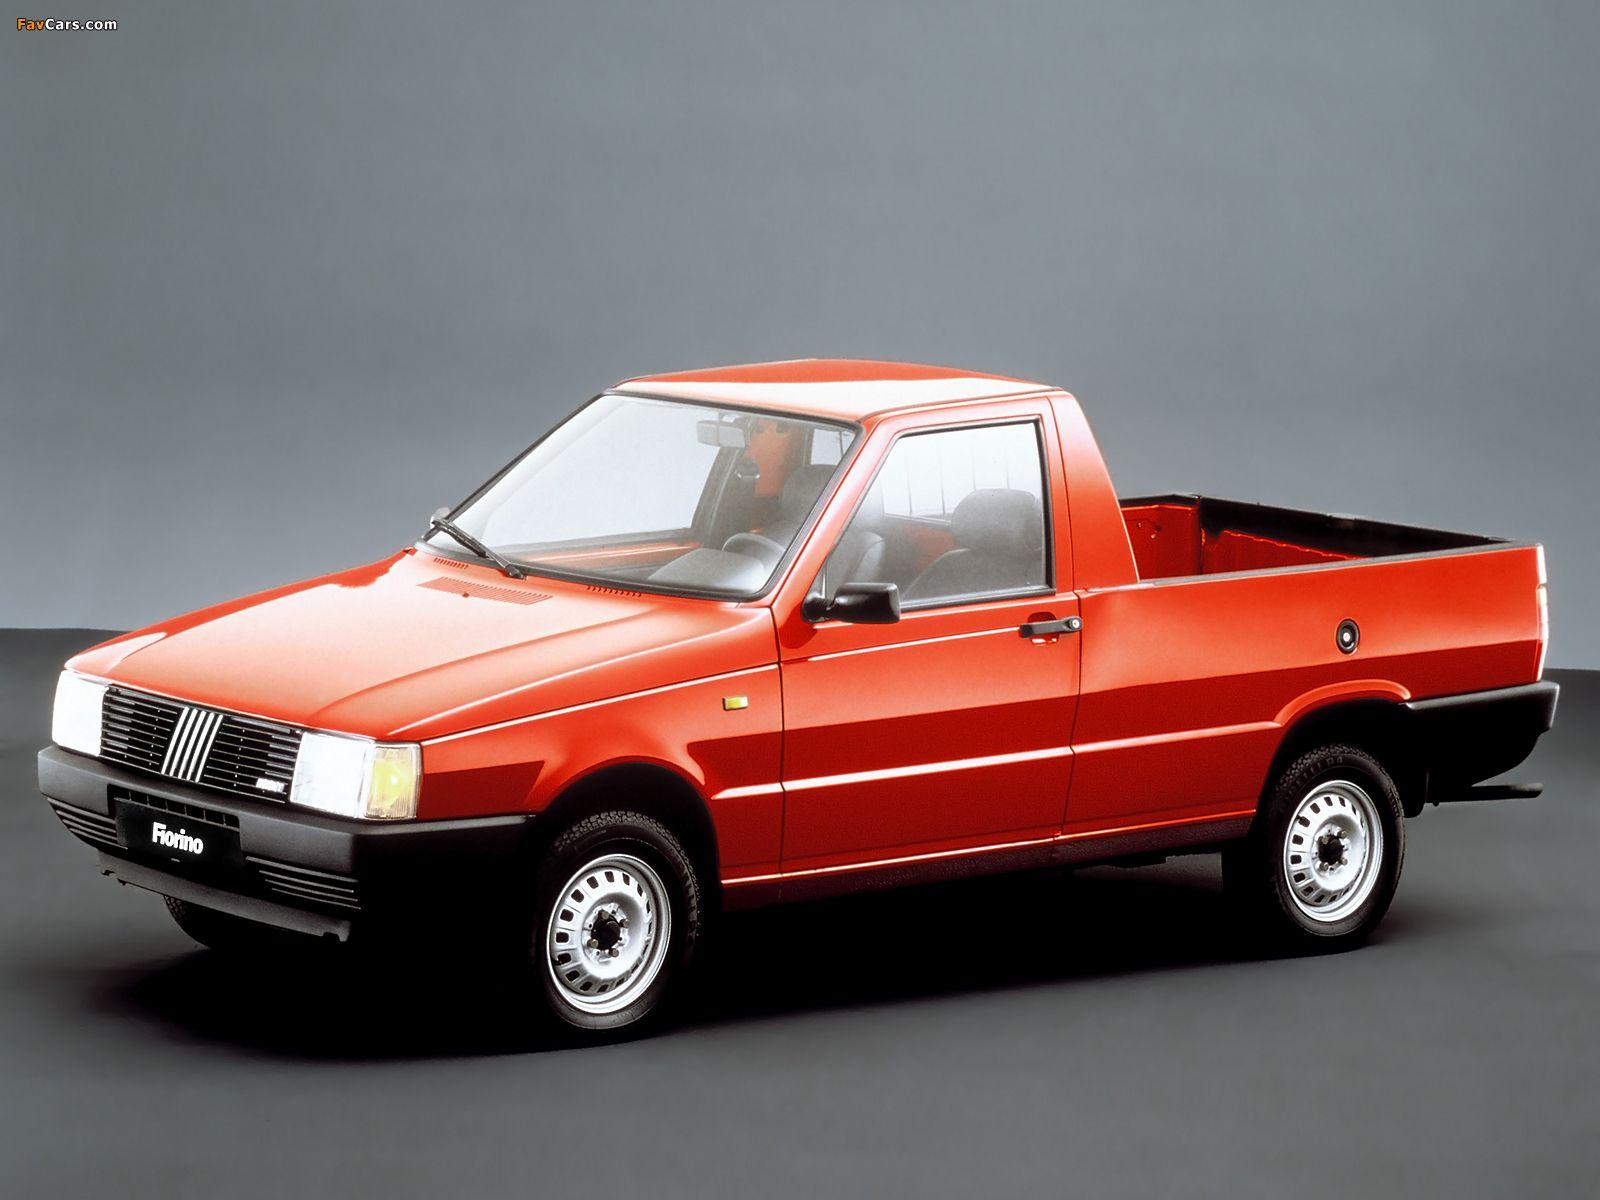 Fiat Fiorino Fiat Caminhonetes Carros Auto